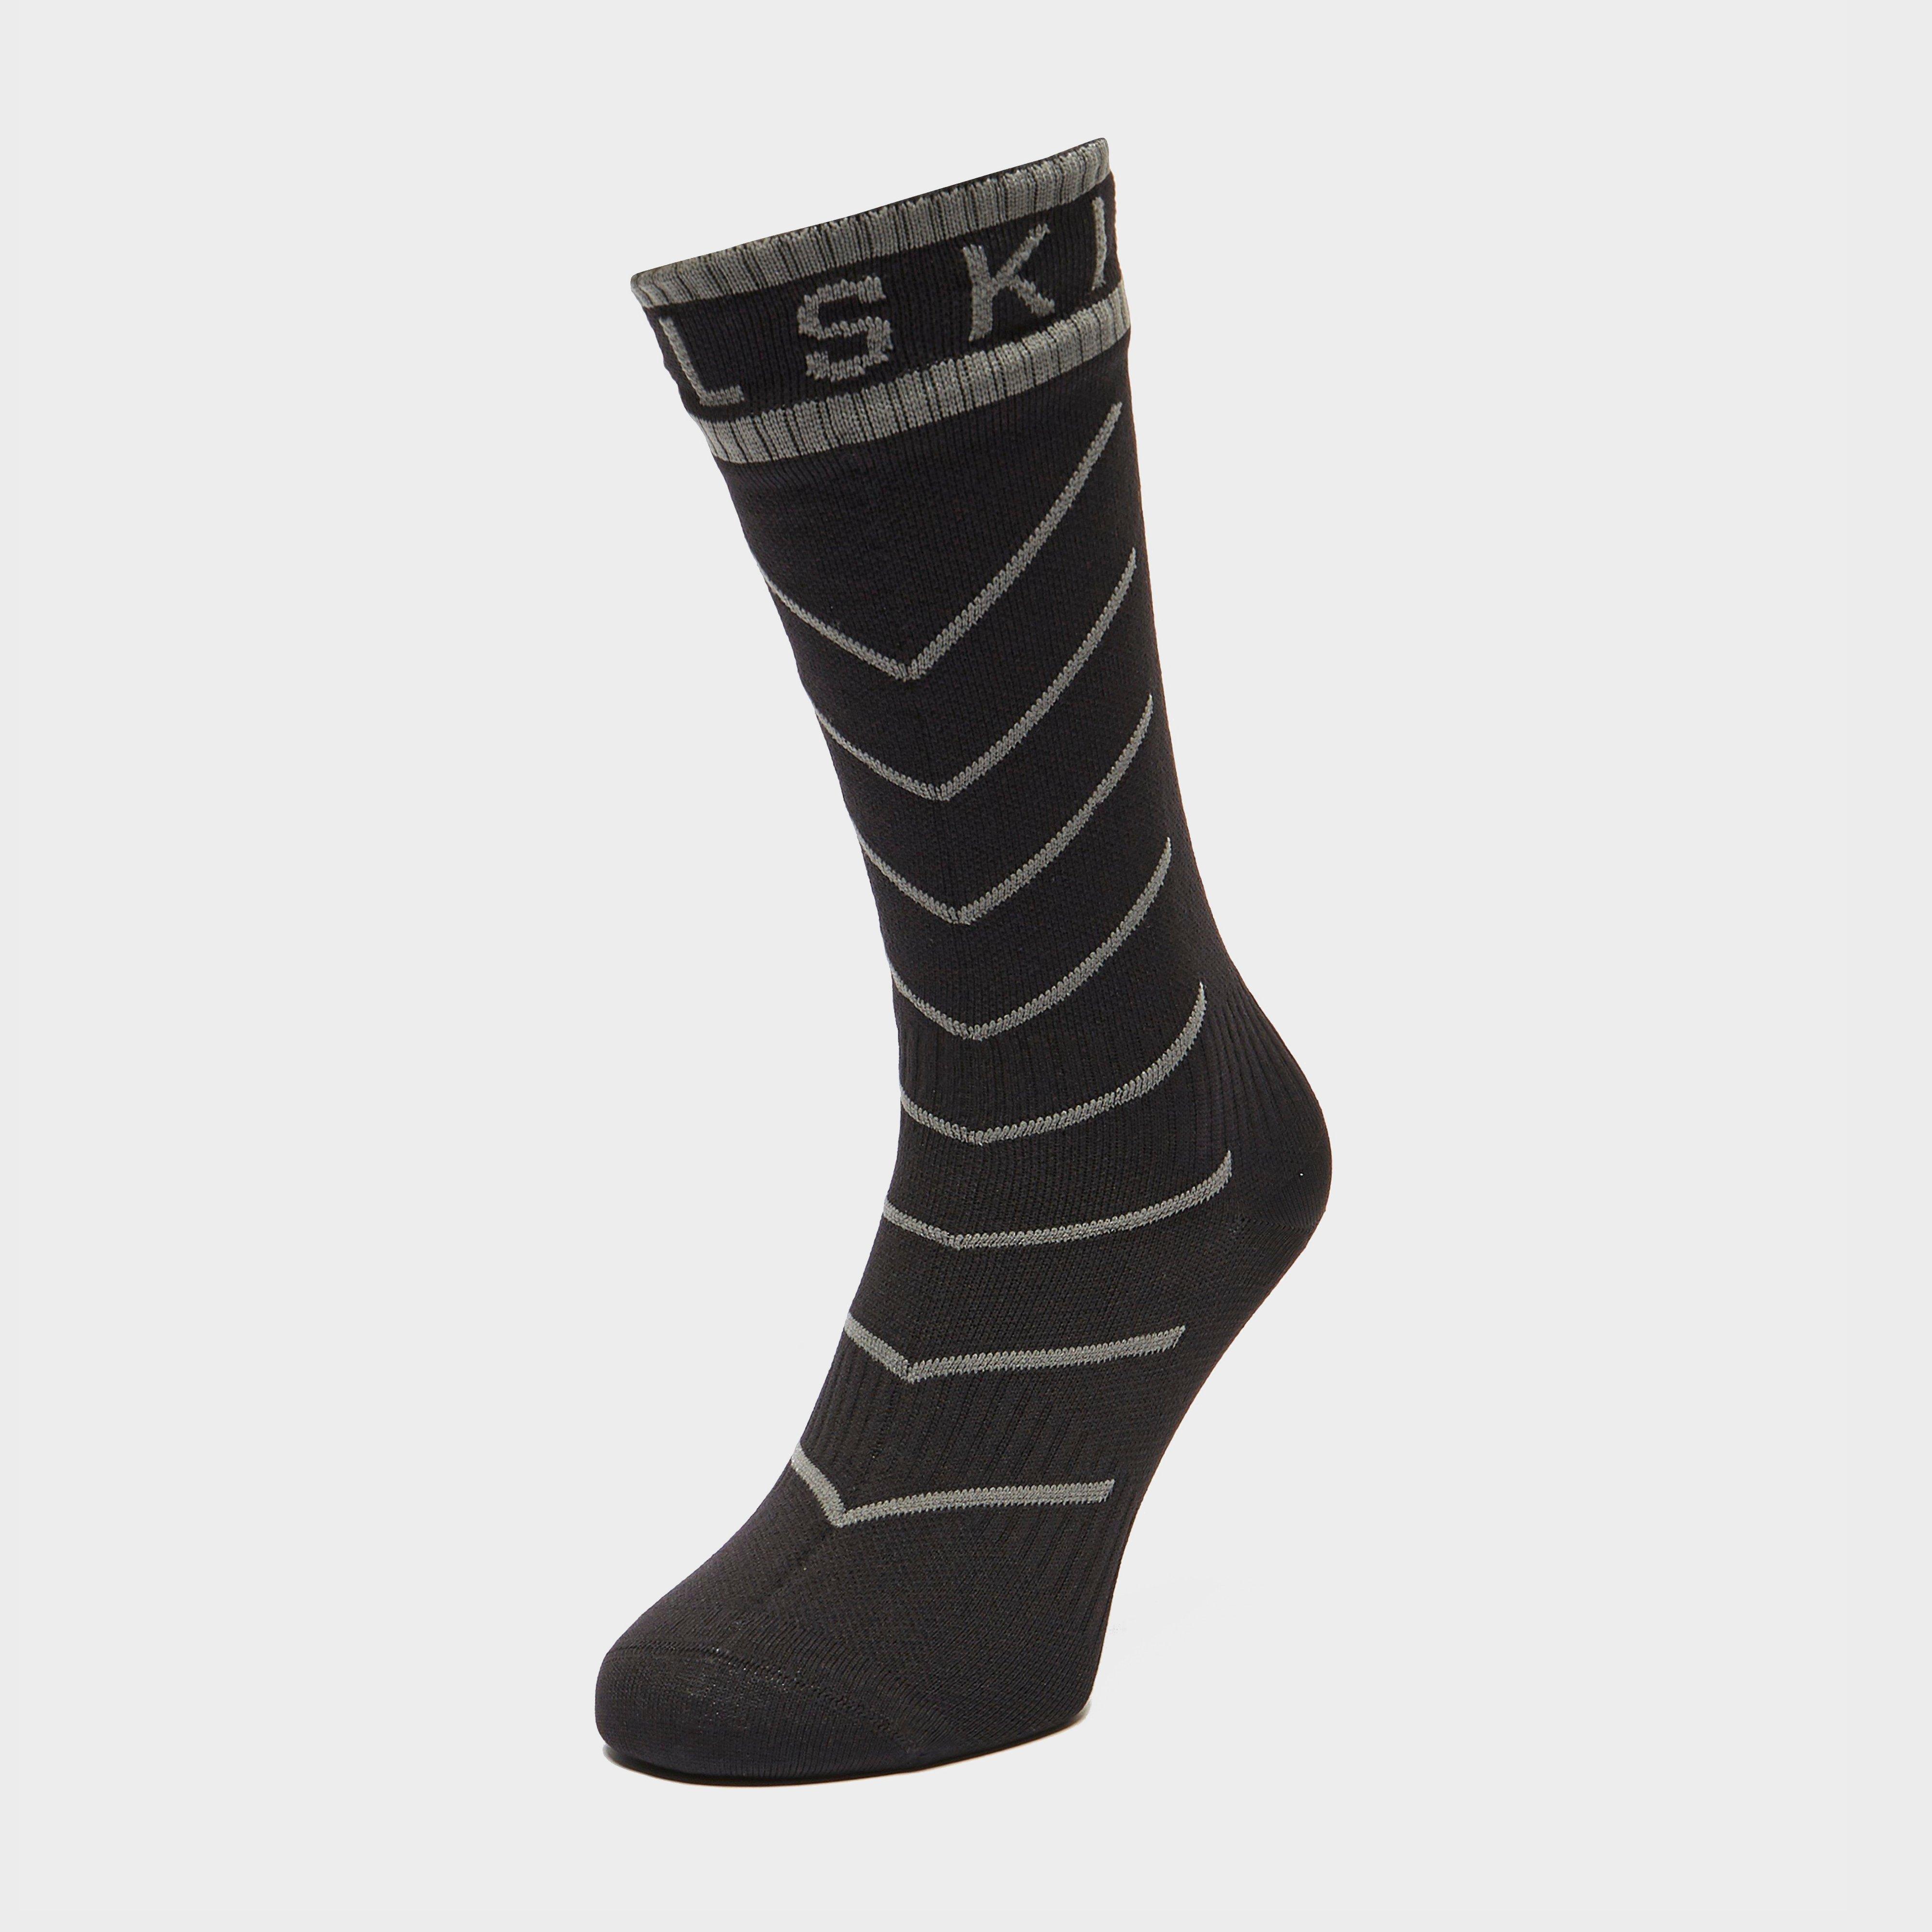 Image of Sealskinz Waterproof Warm Weather Mid Length Socks - Black/Blk, Black/BLK